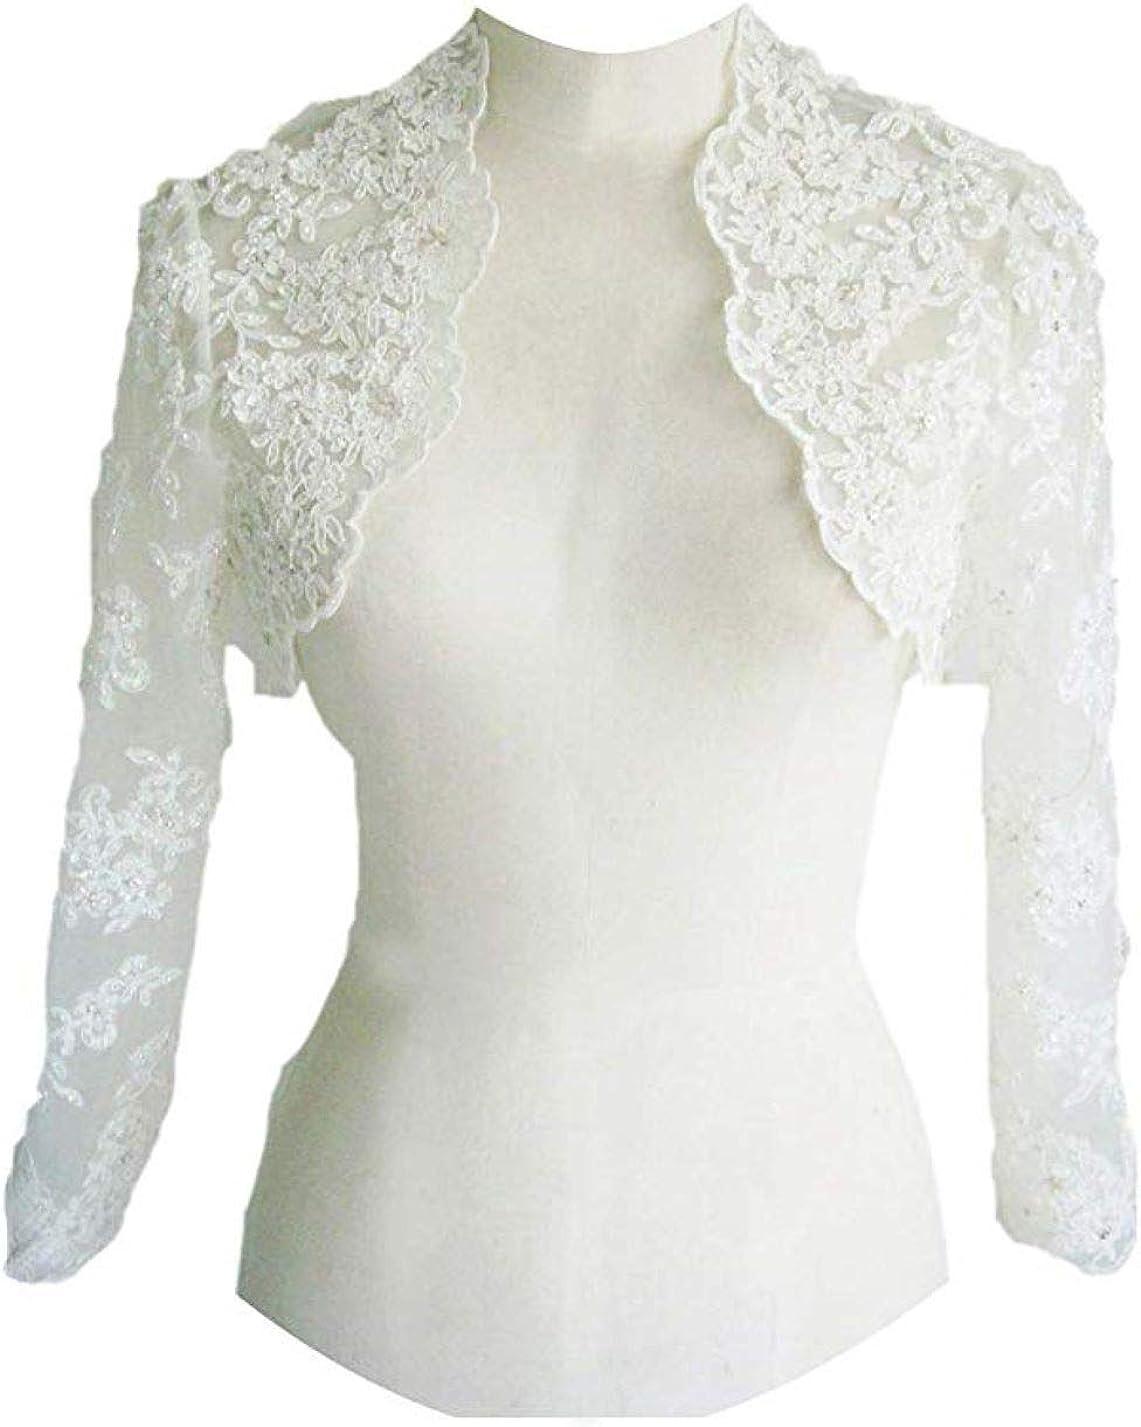 Iluckin Women's Wedding Bridal Bolero Jackets Open Neck Wraps for Bride With Long Sleeves Ball Lace